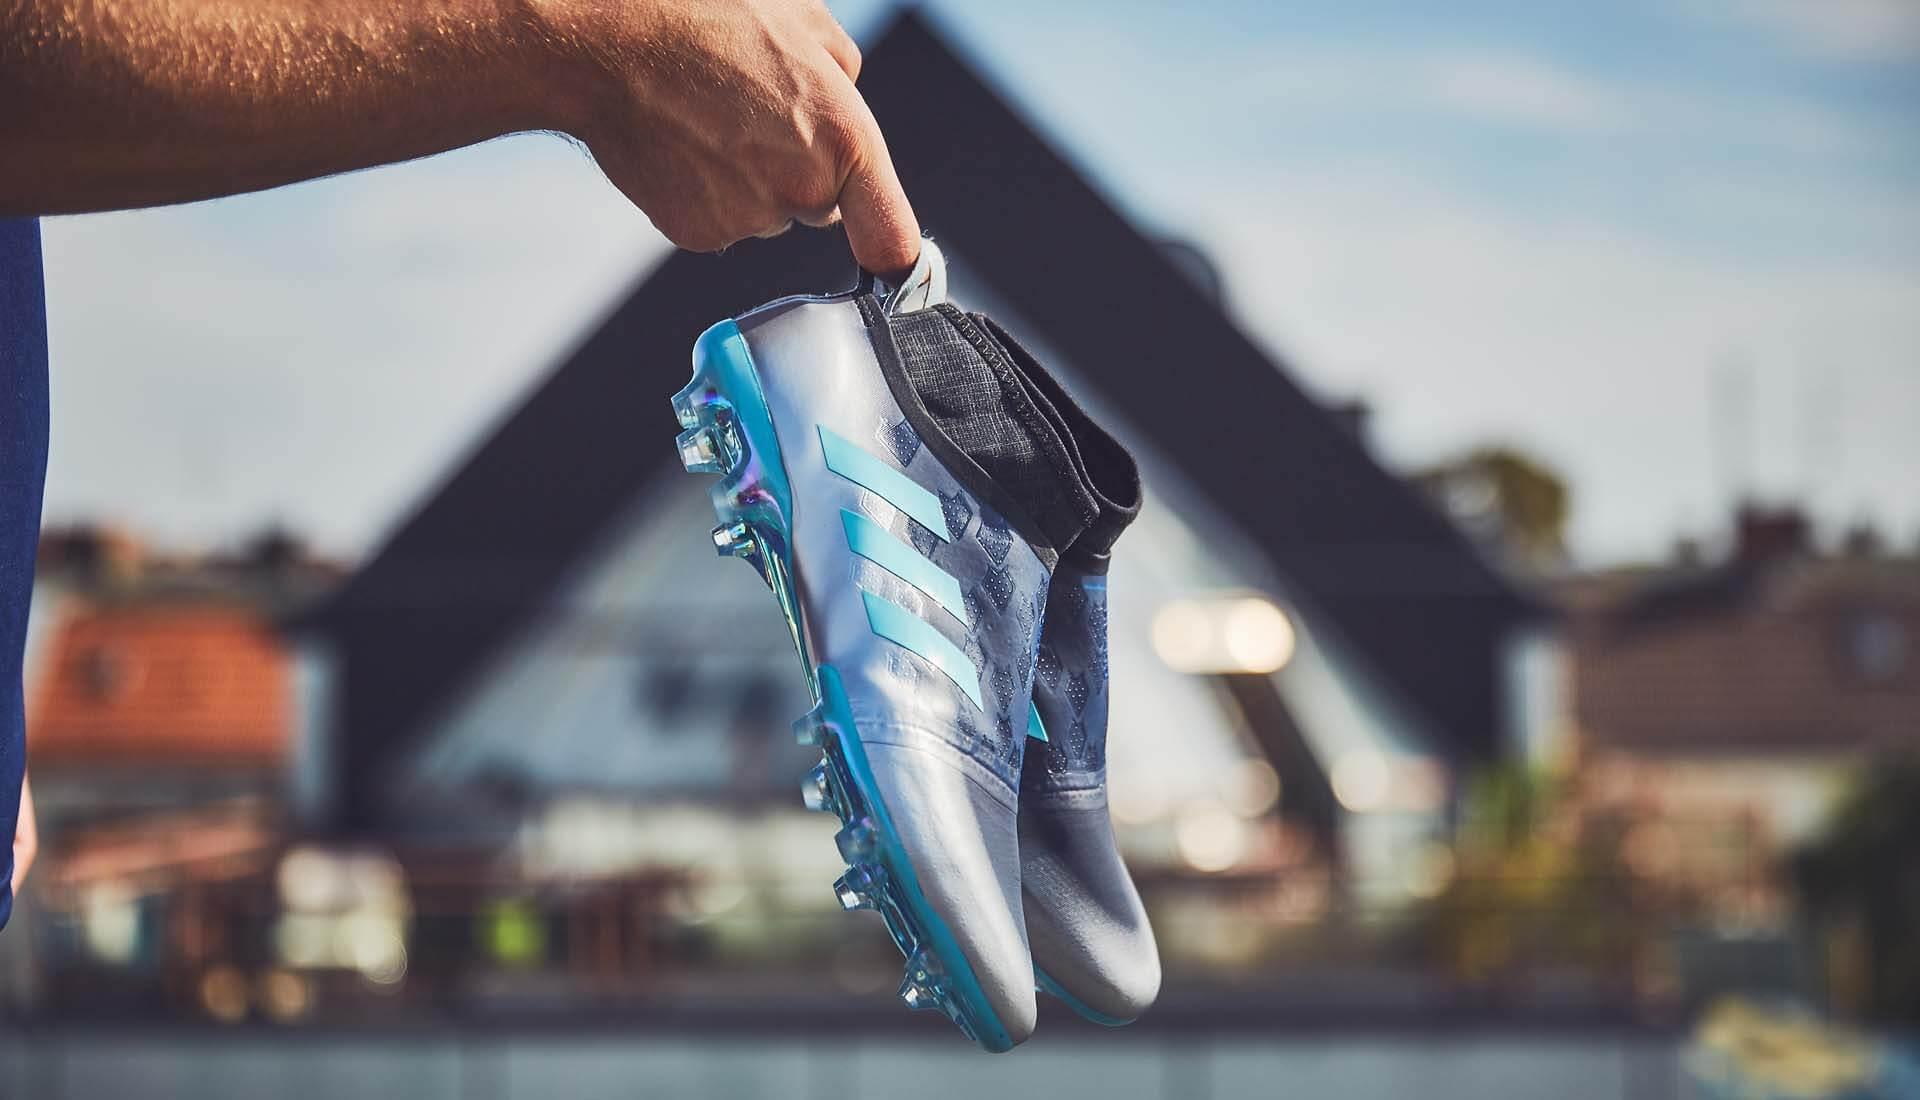 3b4beedb72d9 adidas Glitch 17 Fluido Football Boots - SoccerBible